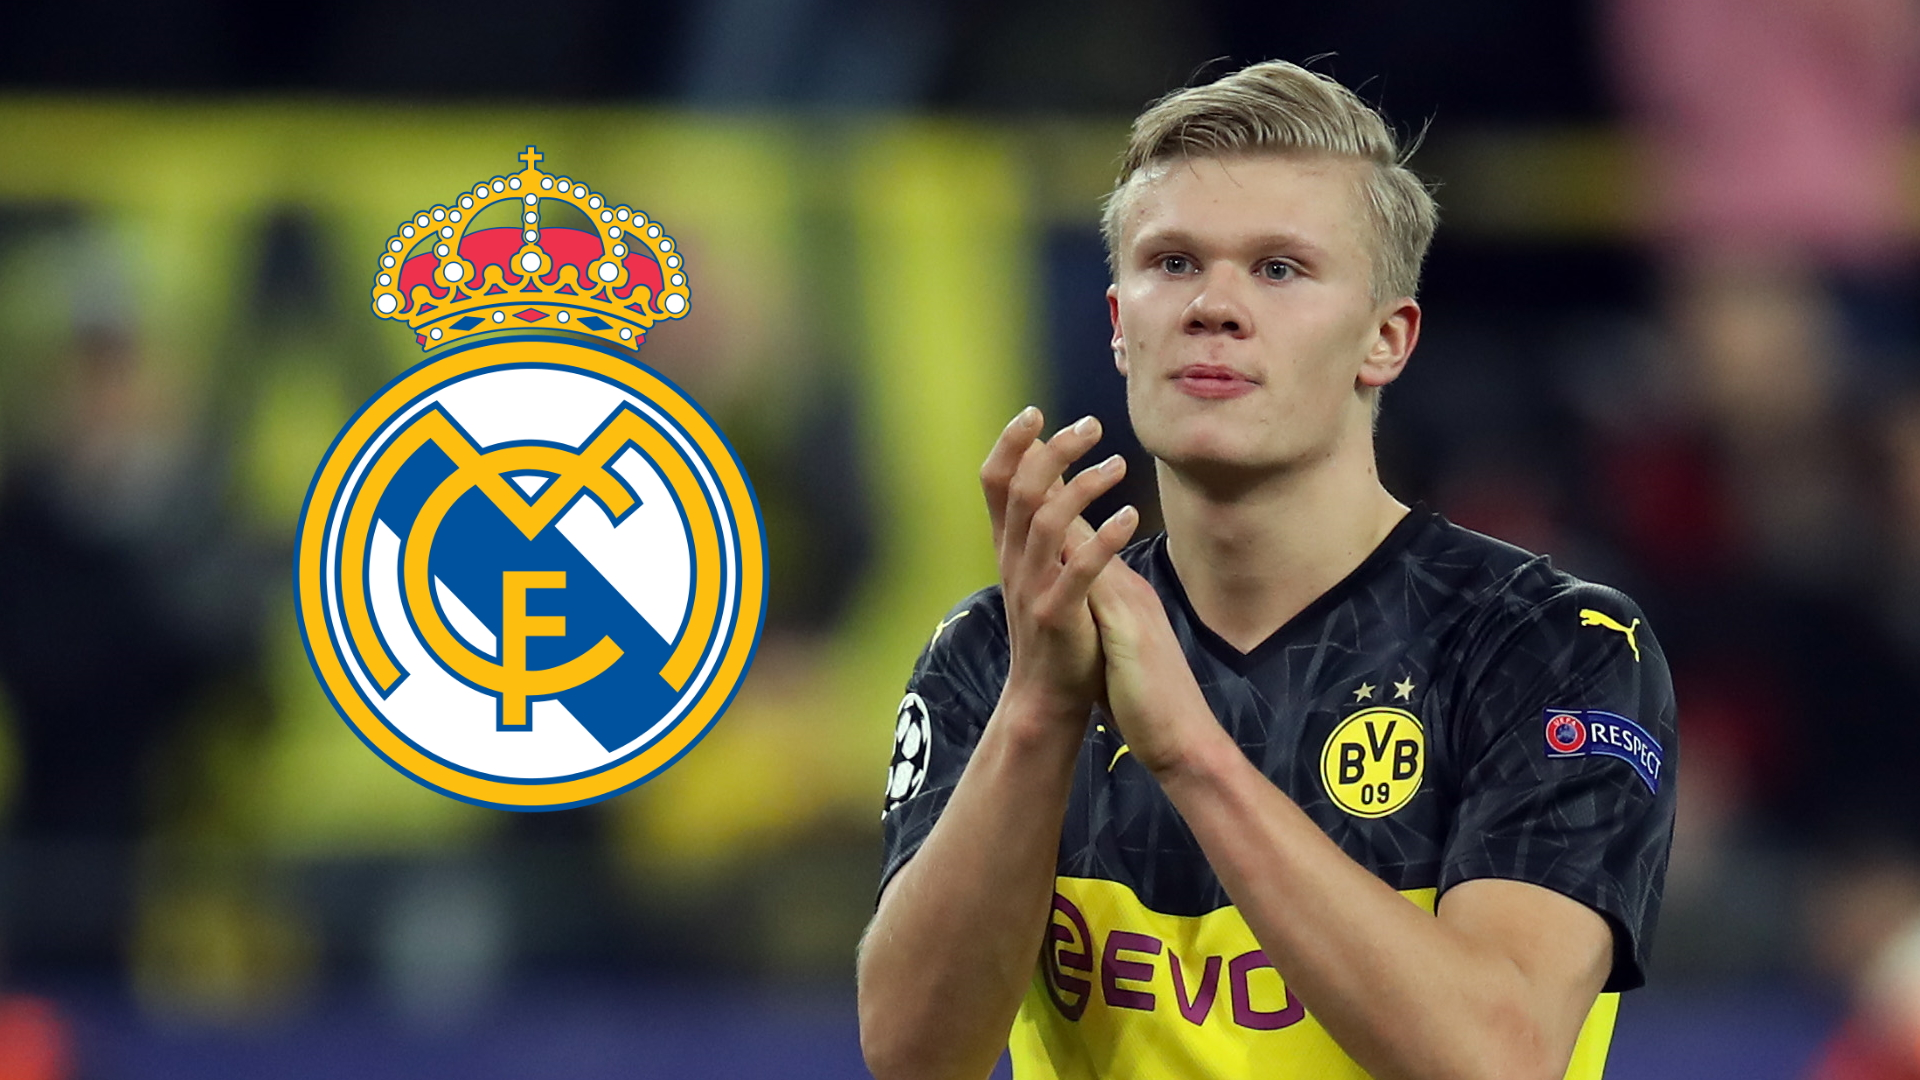 Real Madrid should've beaten Dortmund to Haaland' – Figo questions Blancos'  scouting | Goal.com